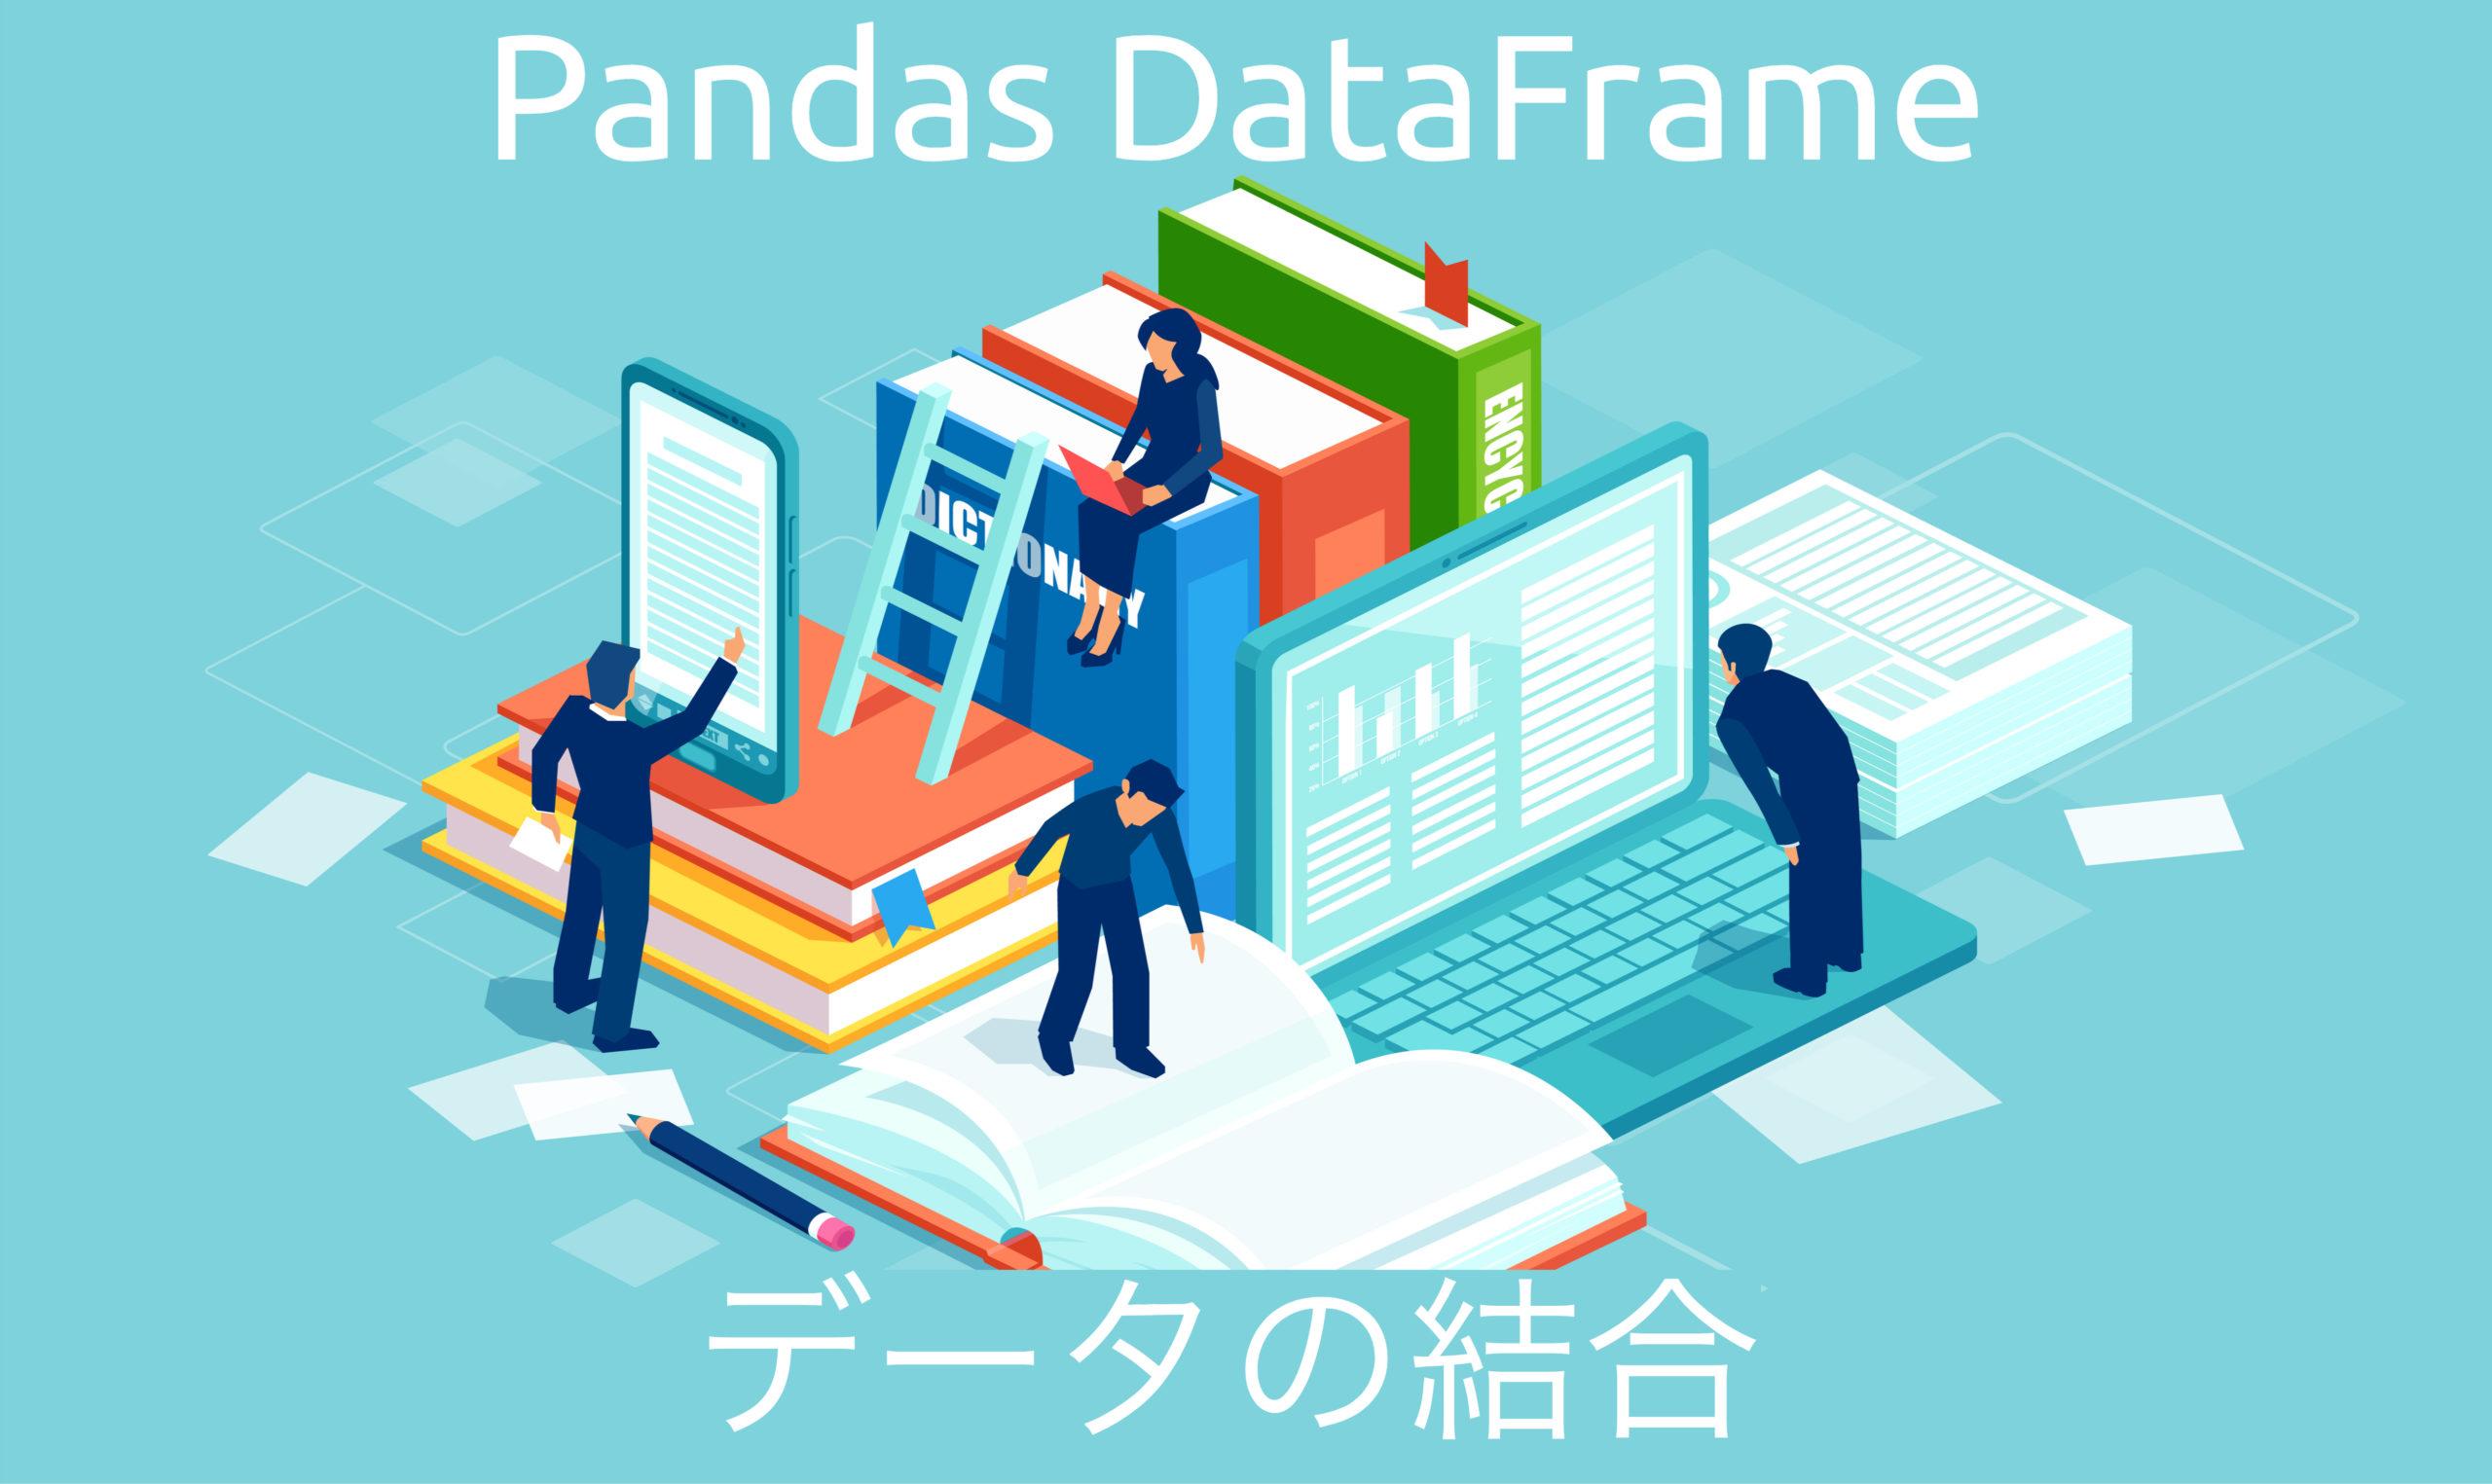 Pandas DataFrame|データフレームの結合方法